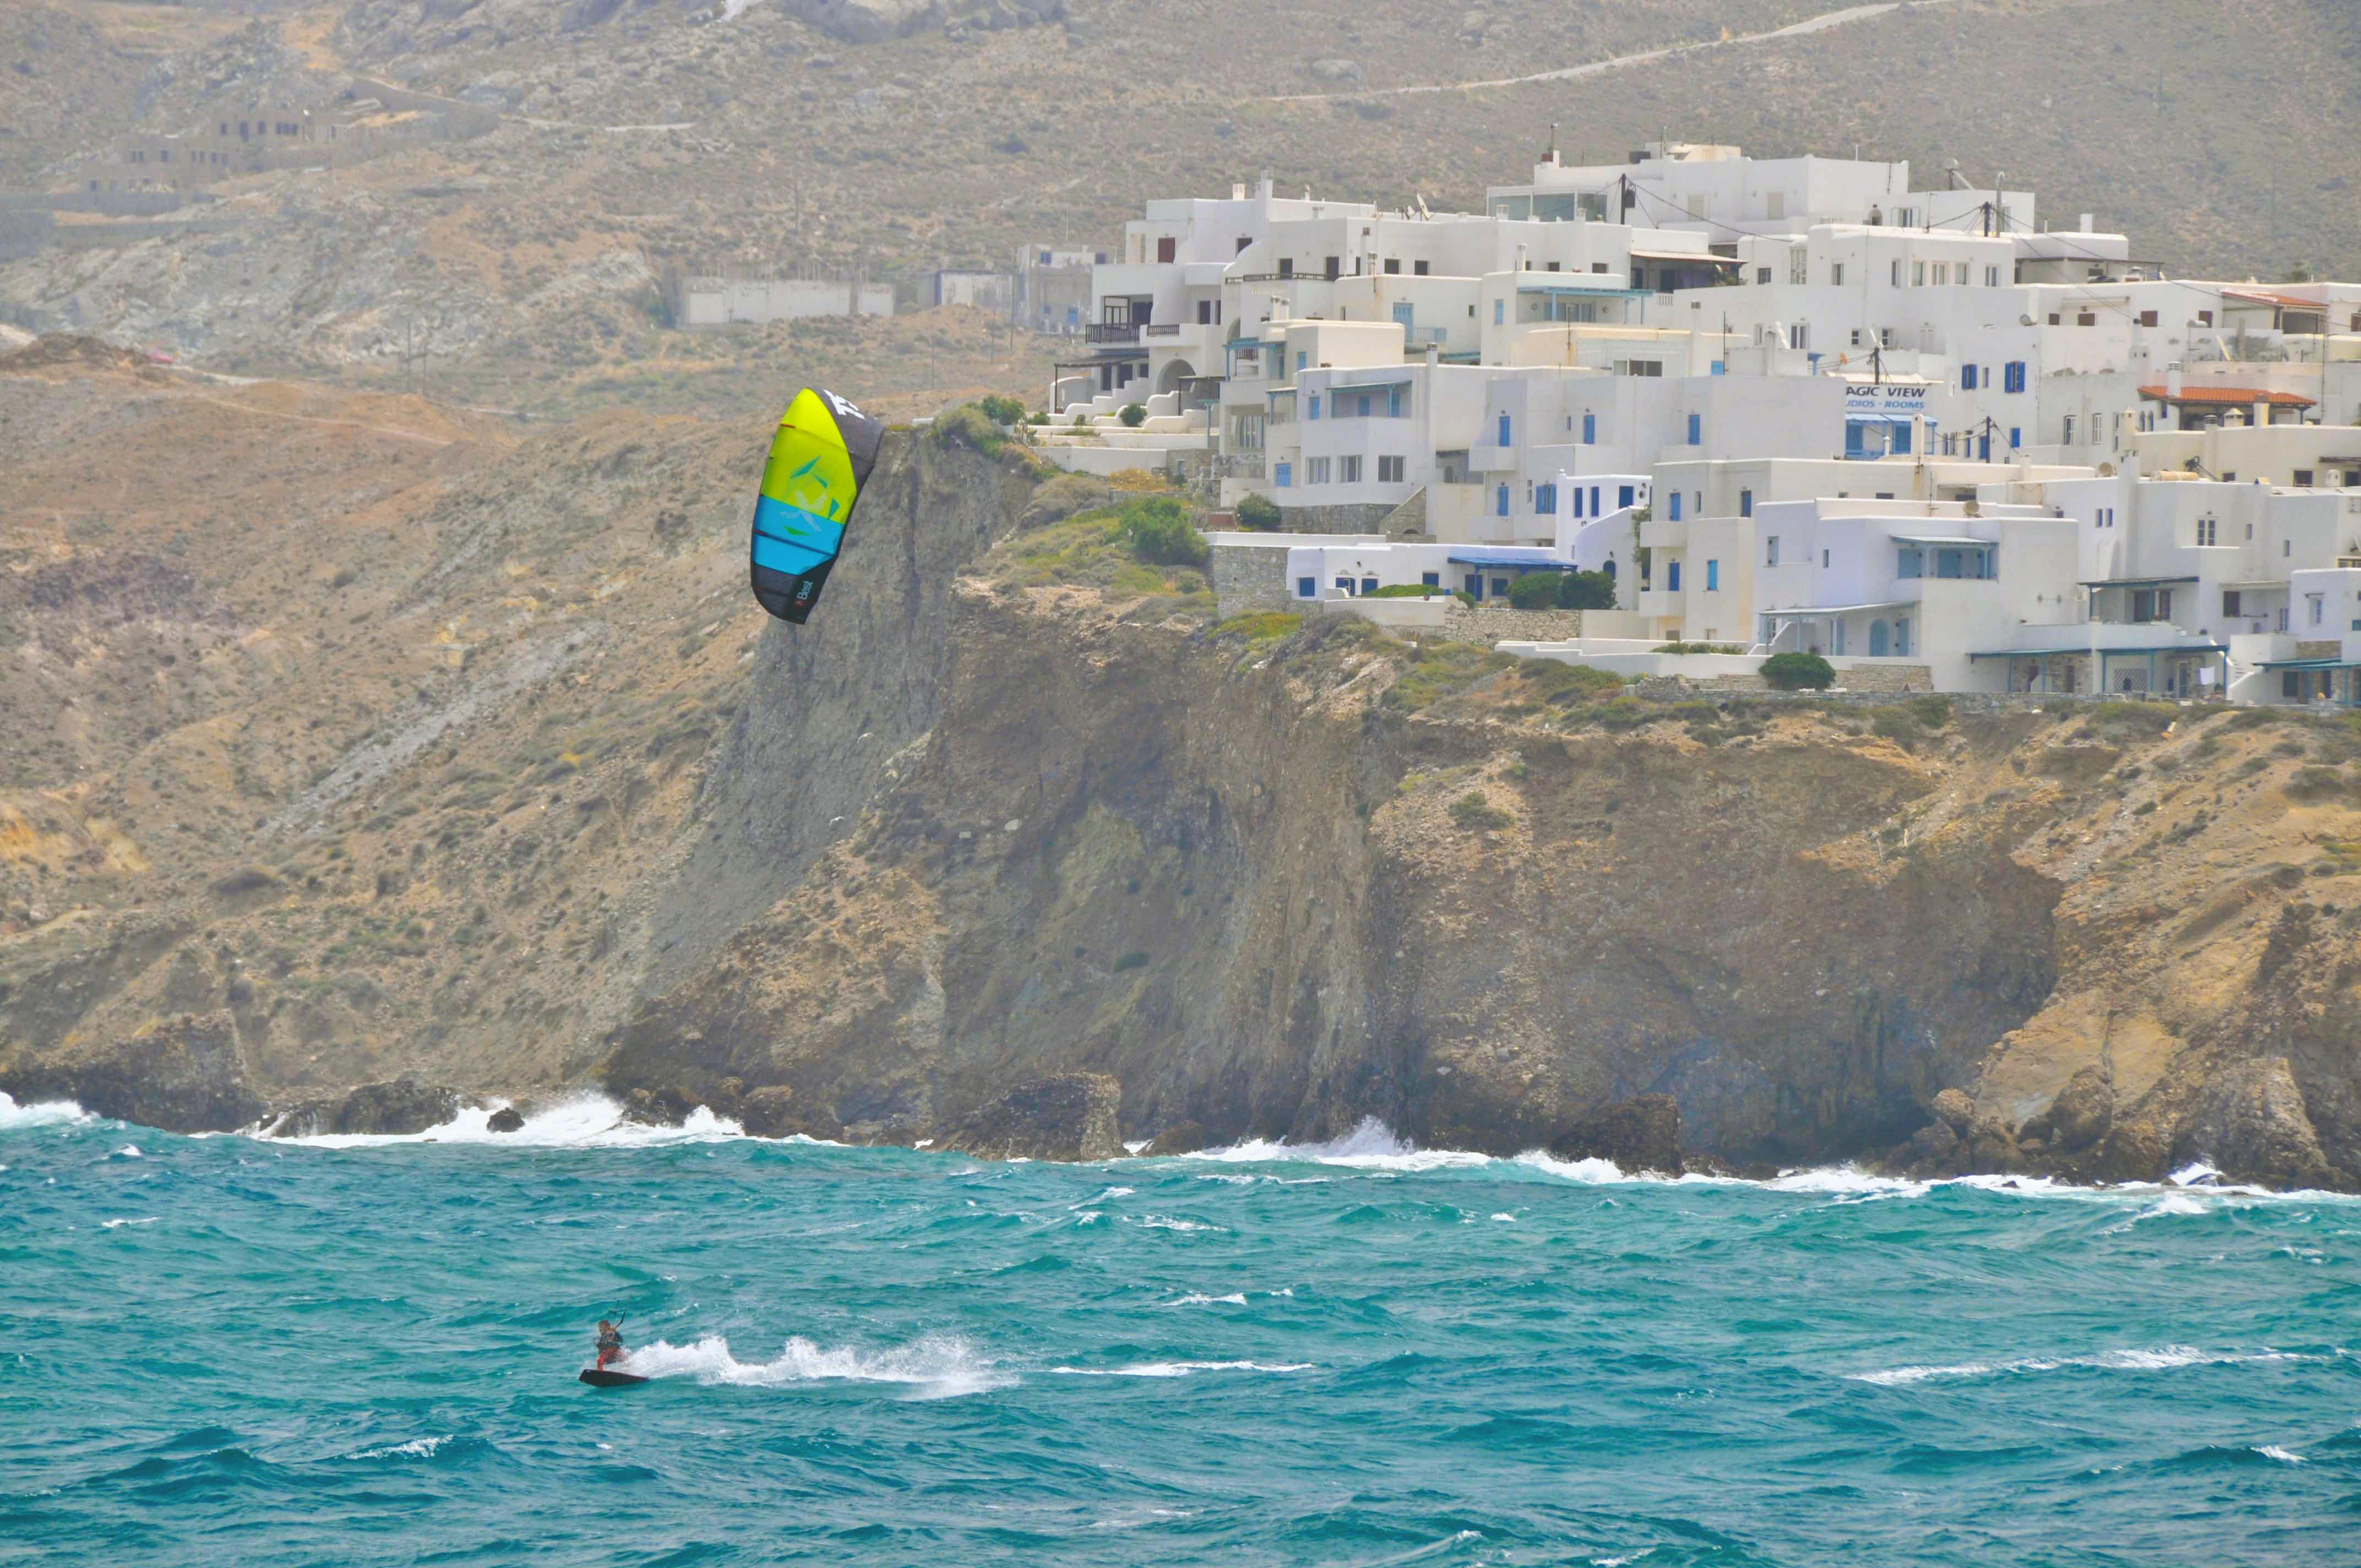 Cyankiteboarding_Kitecruise_Greece_03